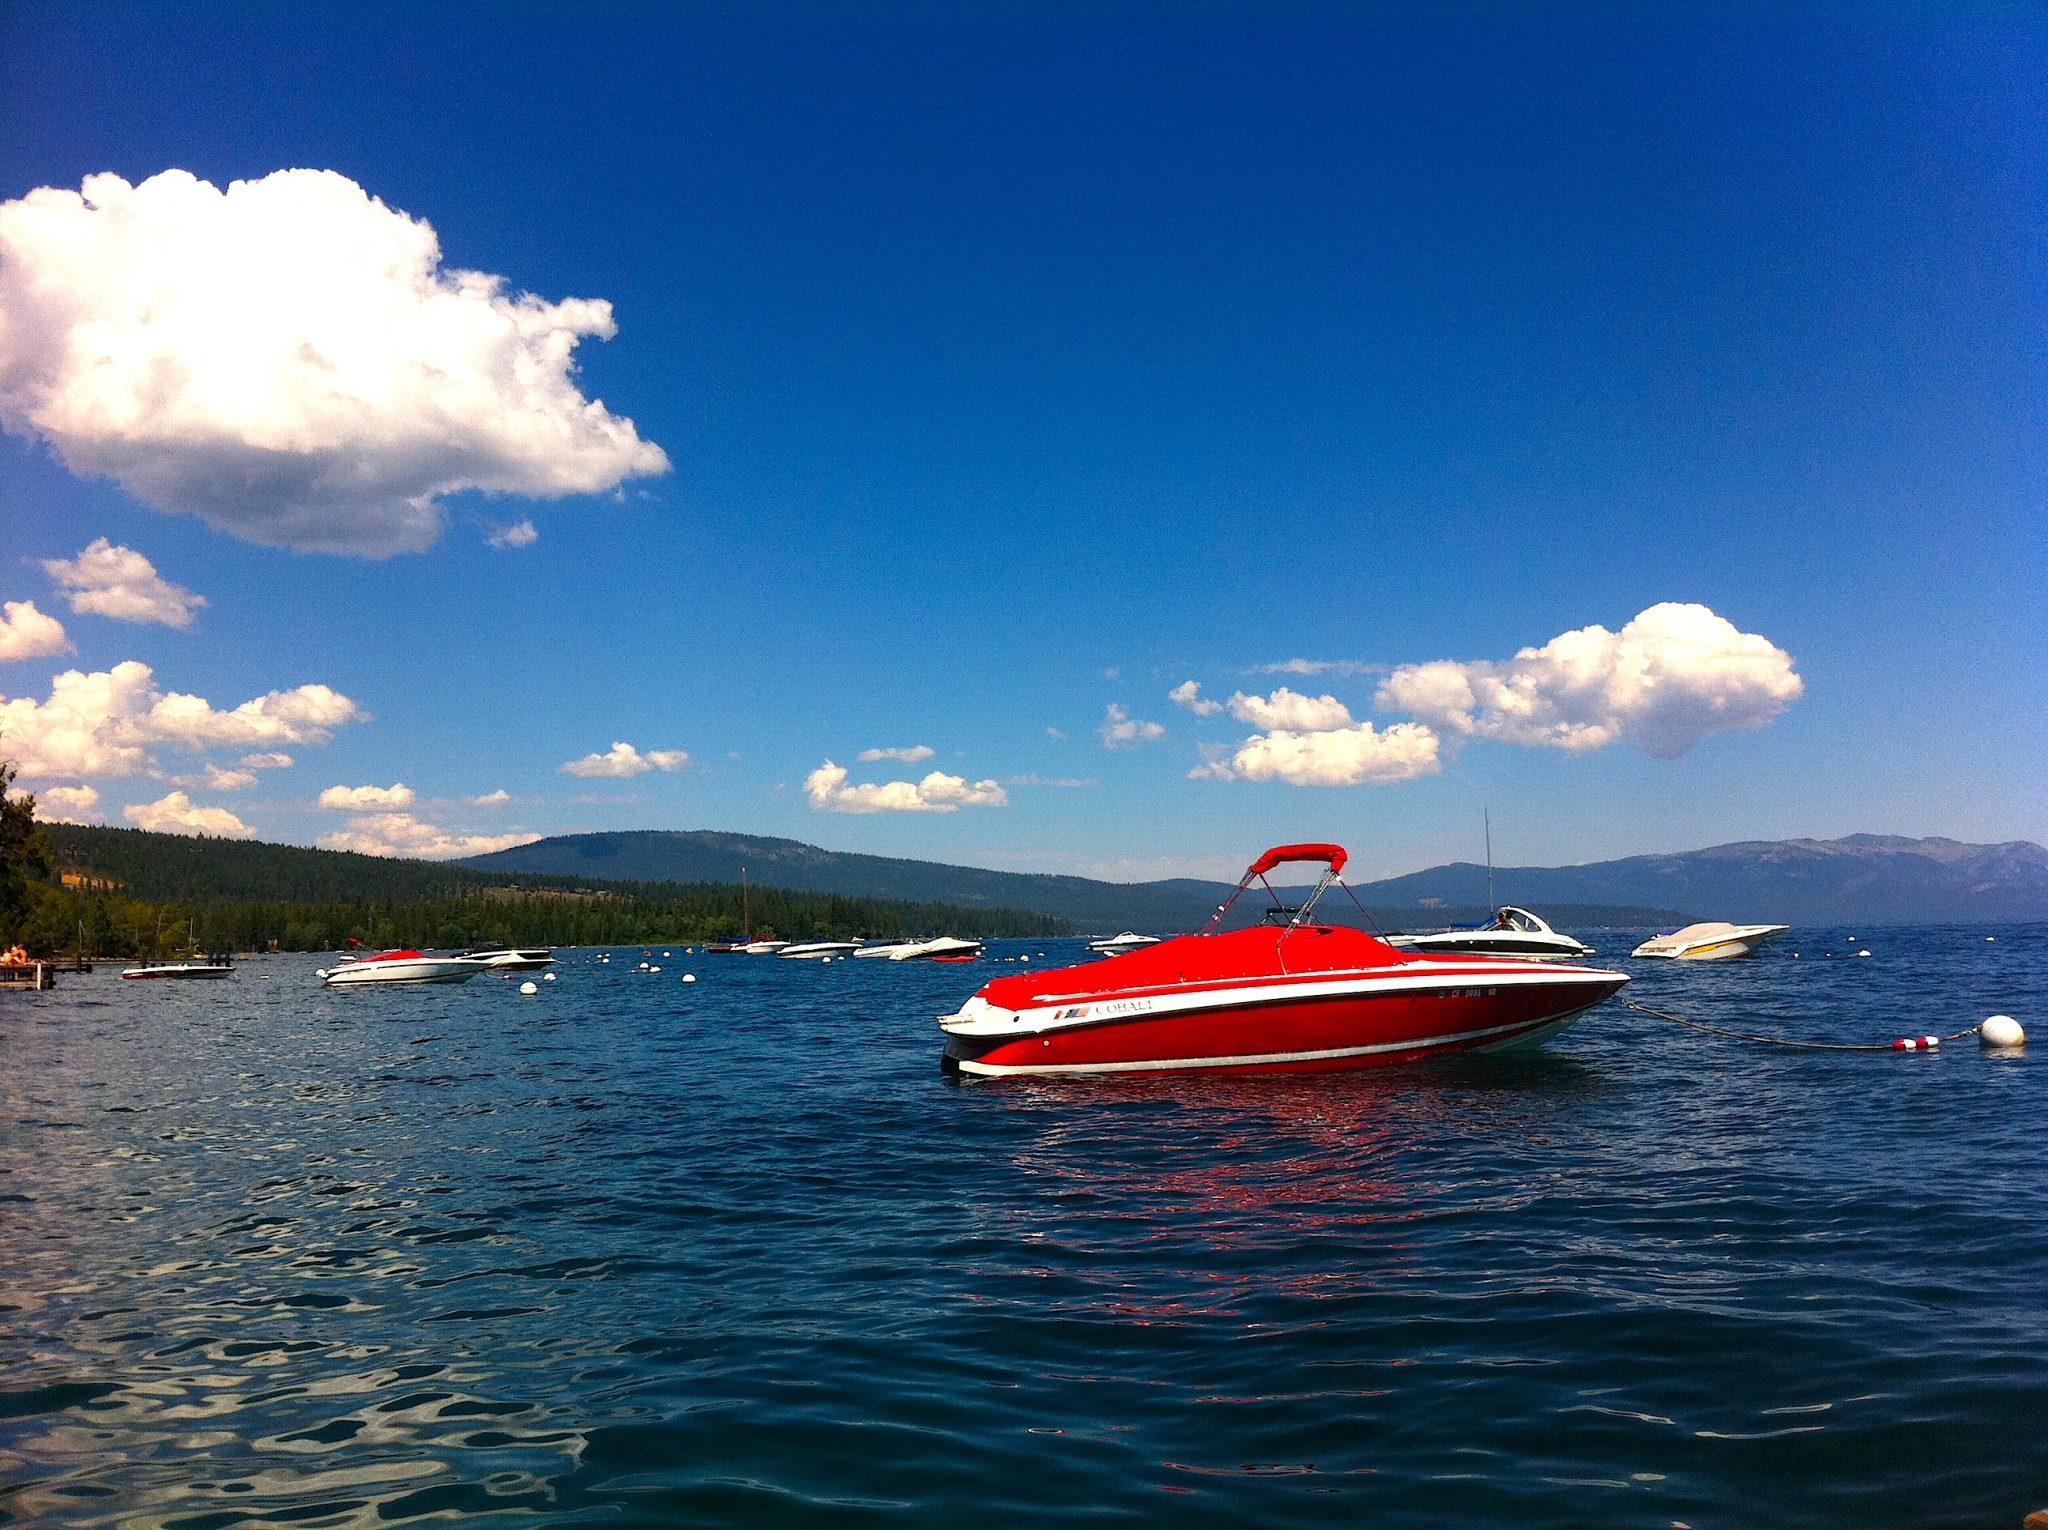 Samurai Boat On Lake Tahoe - Should I Use A Wealth Management Company Like Personal Capital?